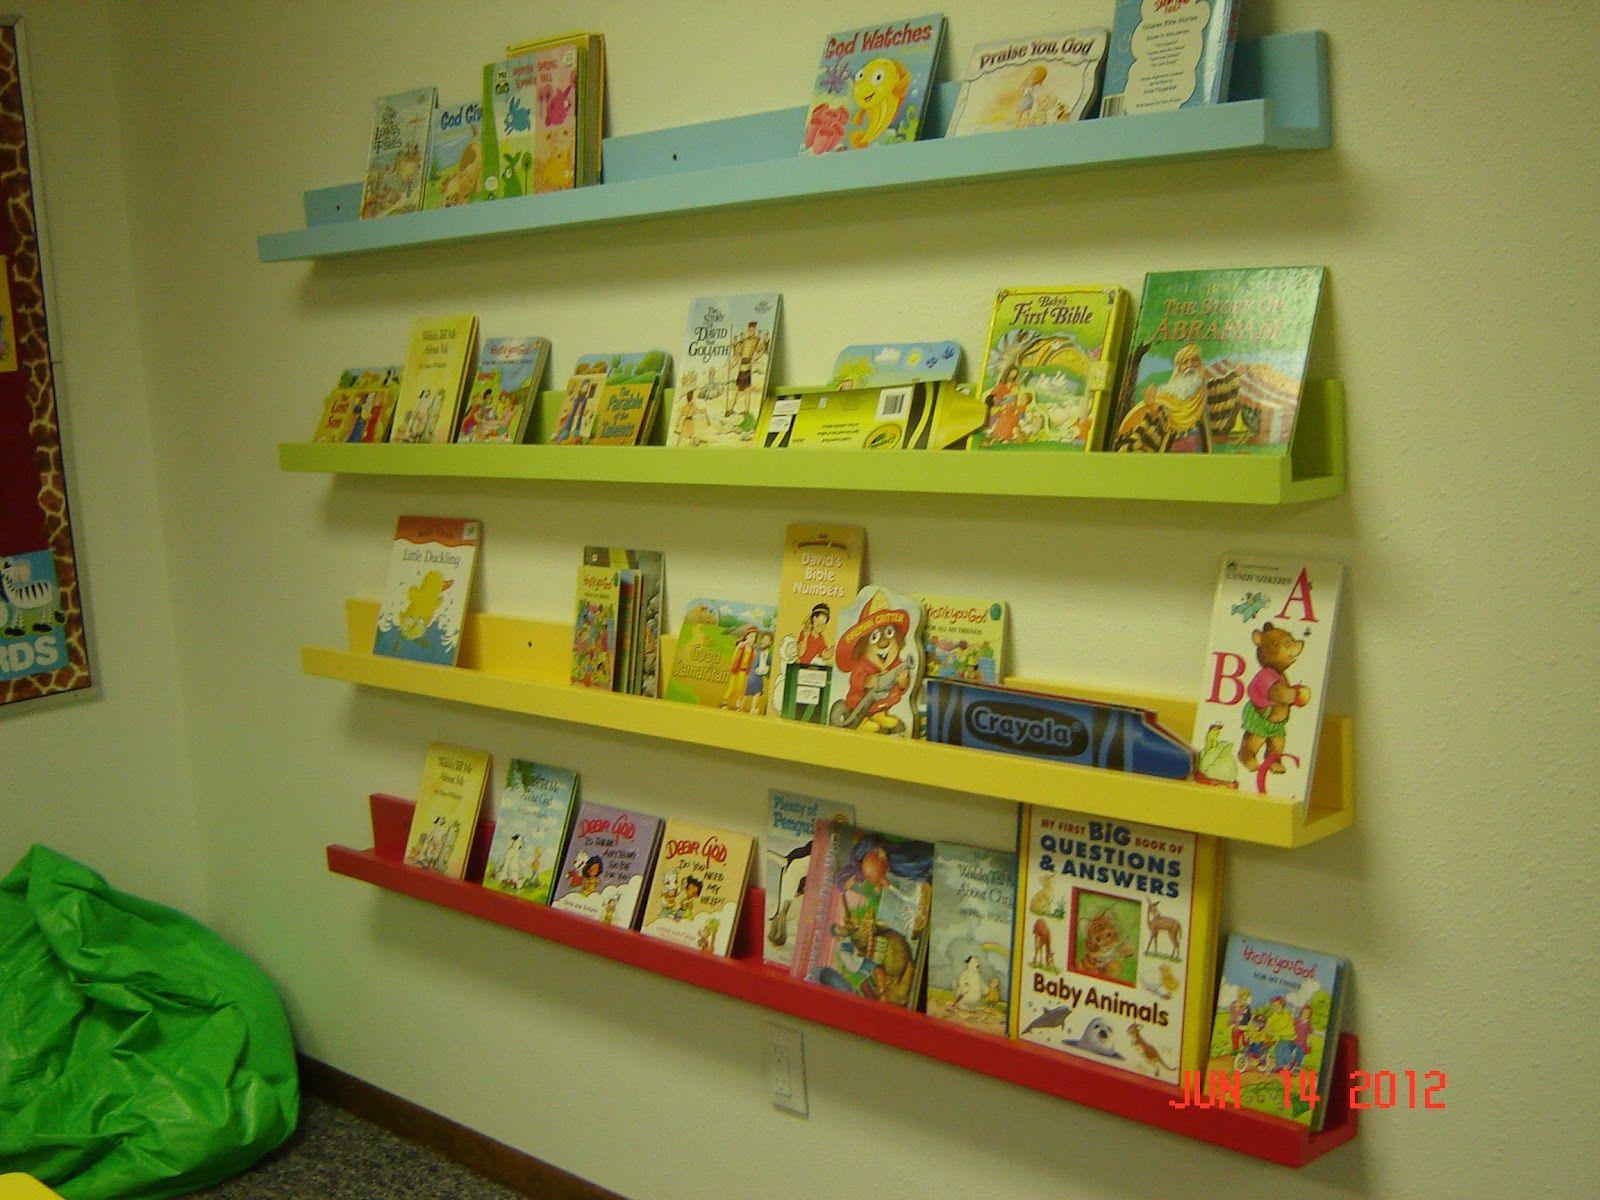 wall bookshelf | Church nursery ideas | Pinterest | Church nursery ...